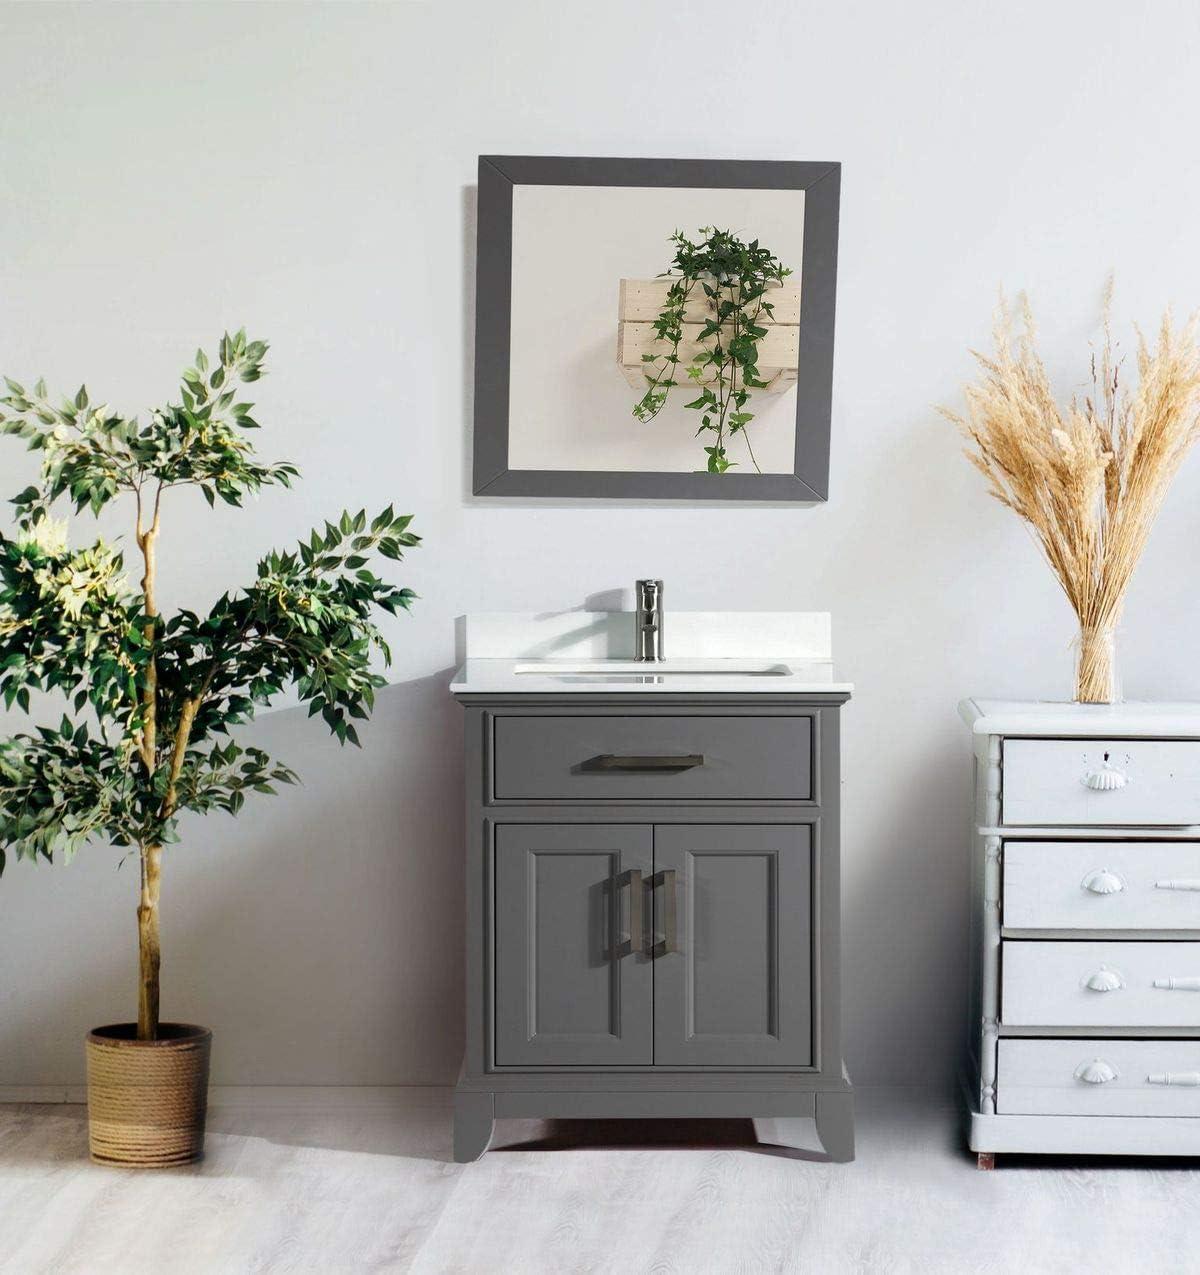 Vanity Art 30 Inches Single Sink Bathroom Vanity Set White Super Phoenix Stone Top 1 Drawer 1 Shelf Undermount Rectangle Sink Cabinet With Free Mirror Va1030 G Amazon Com